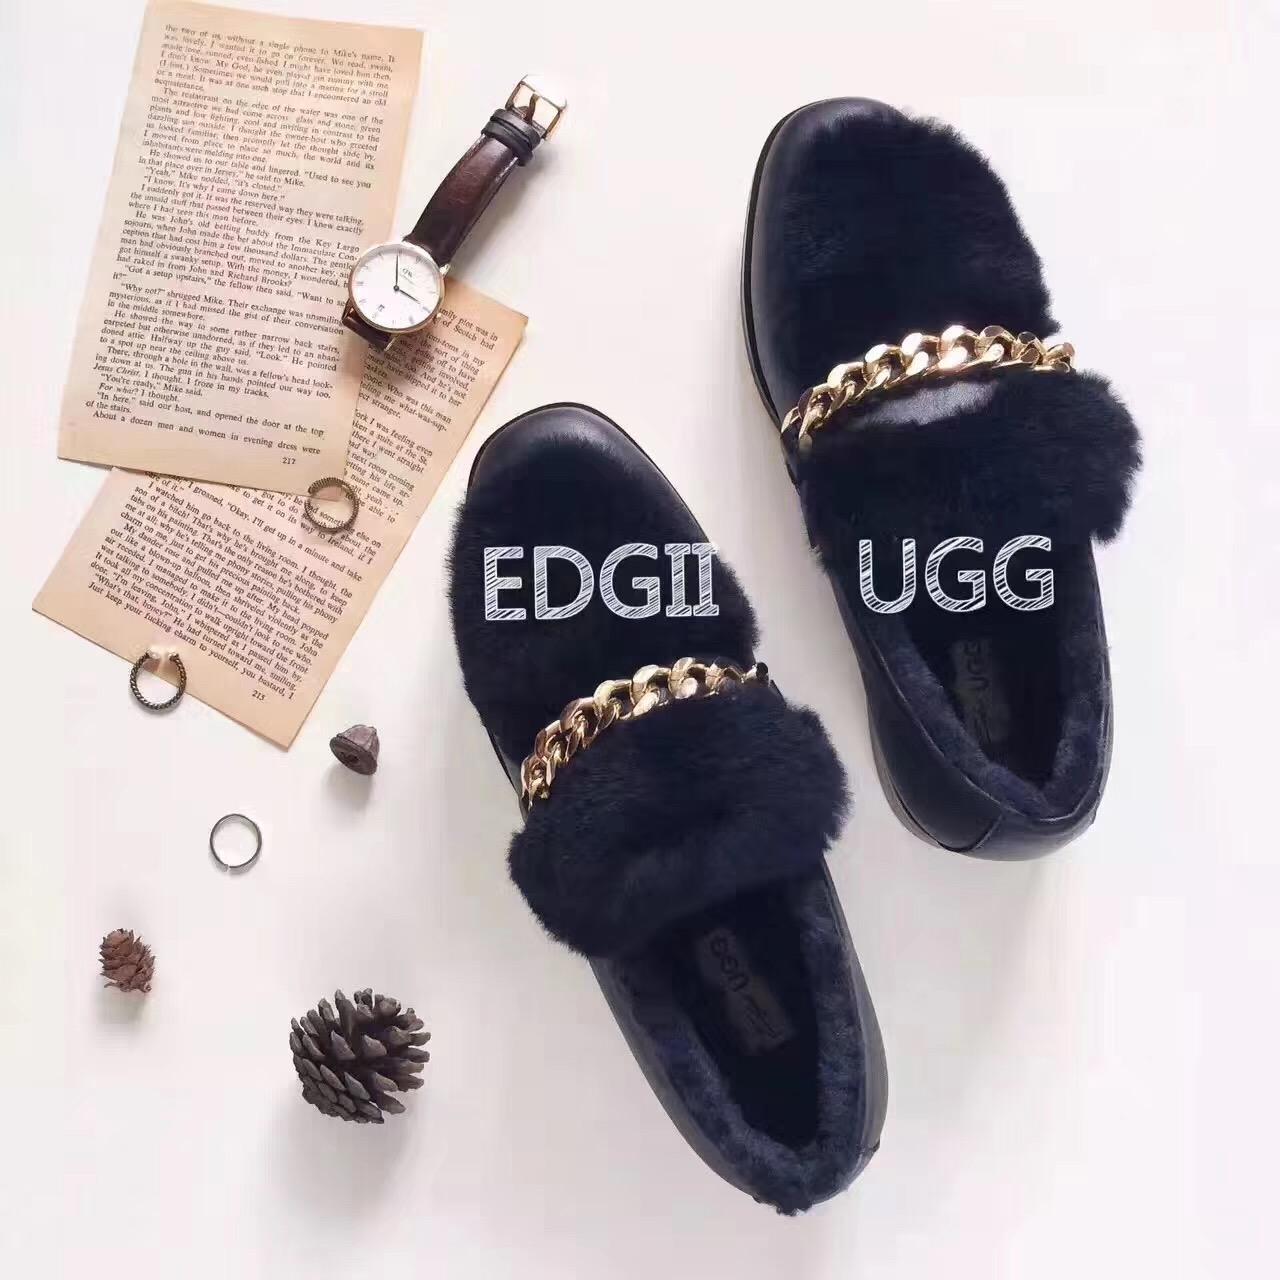 Edgii Vincu 链条时尚豆豆鞋 EDF0003